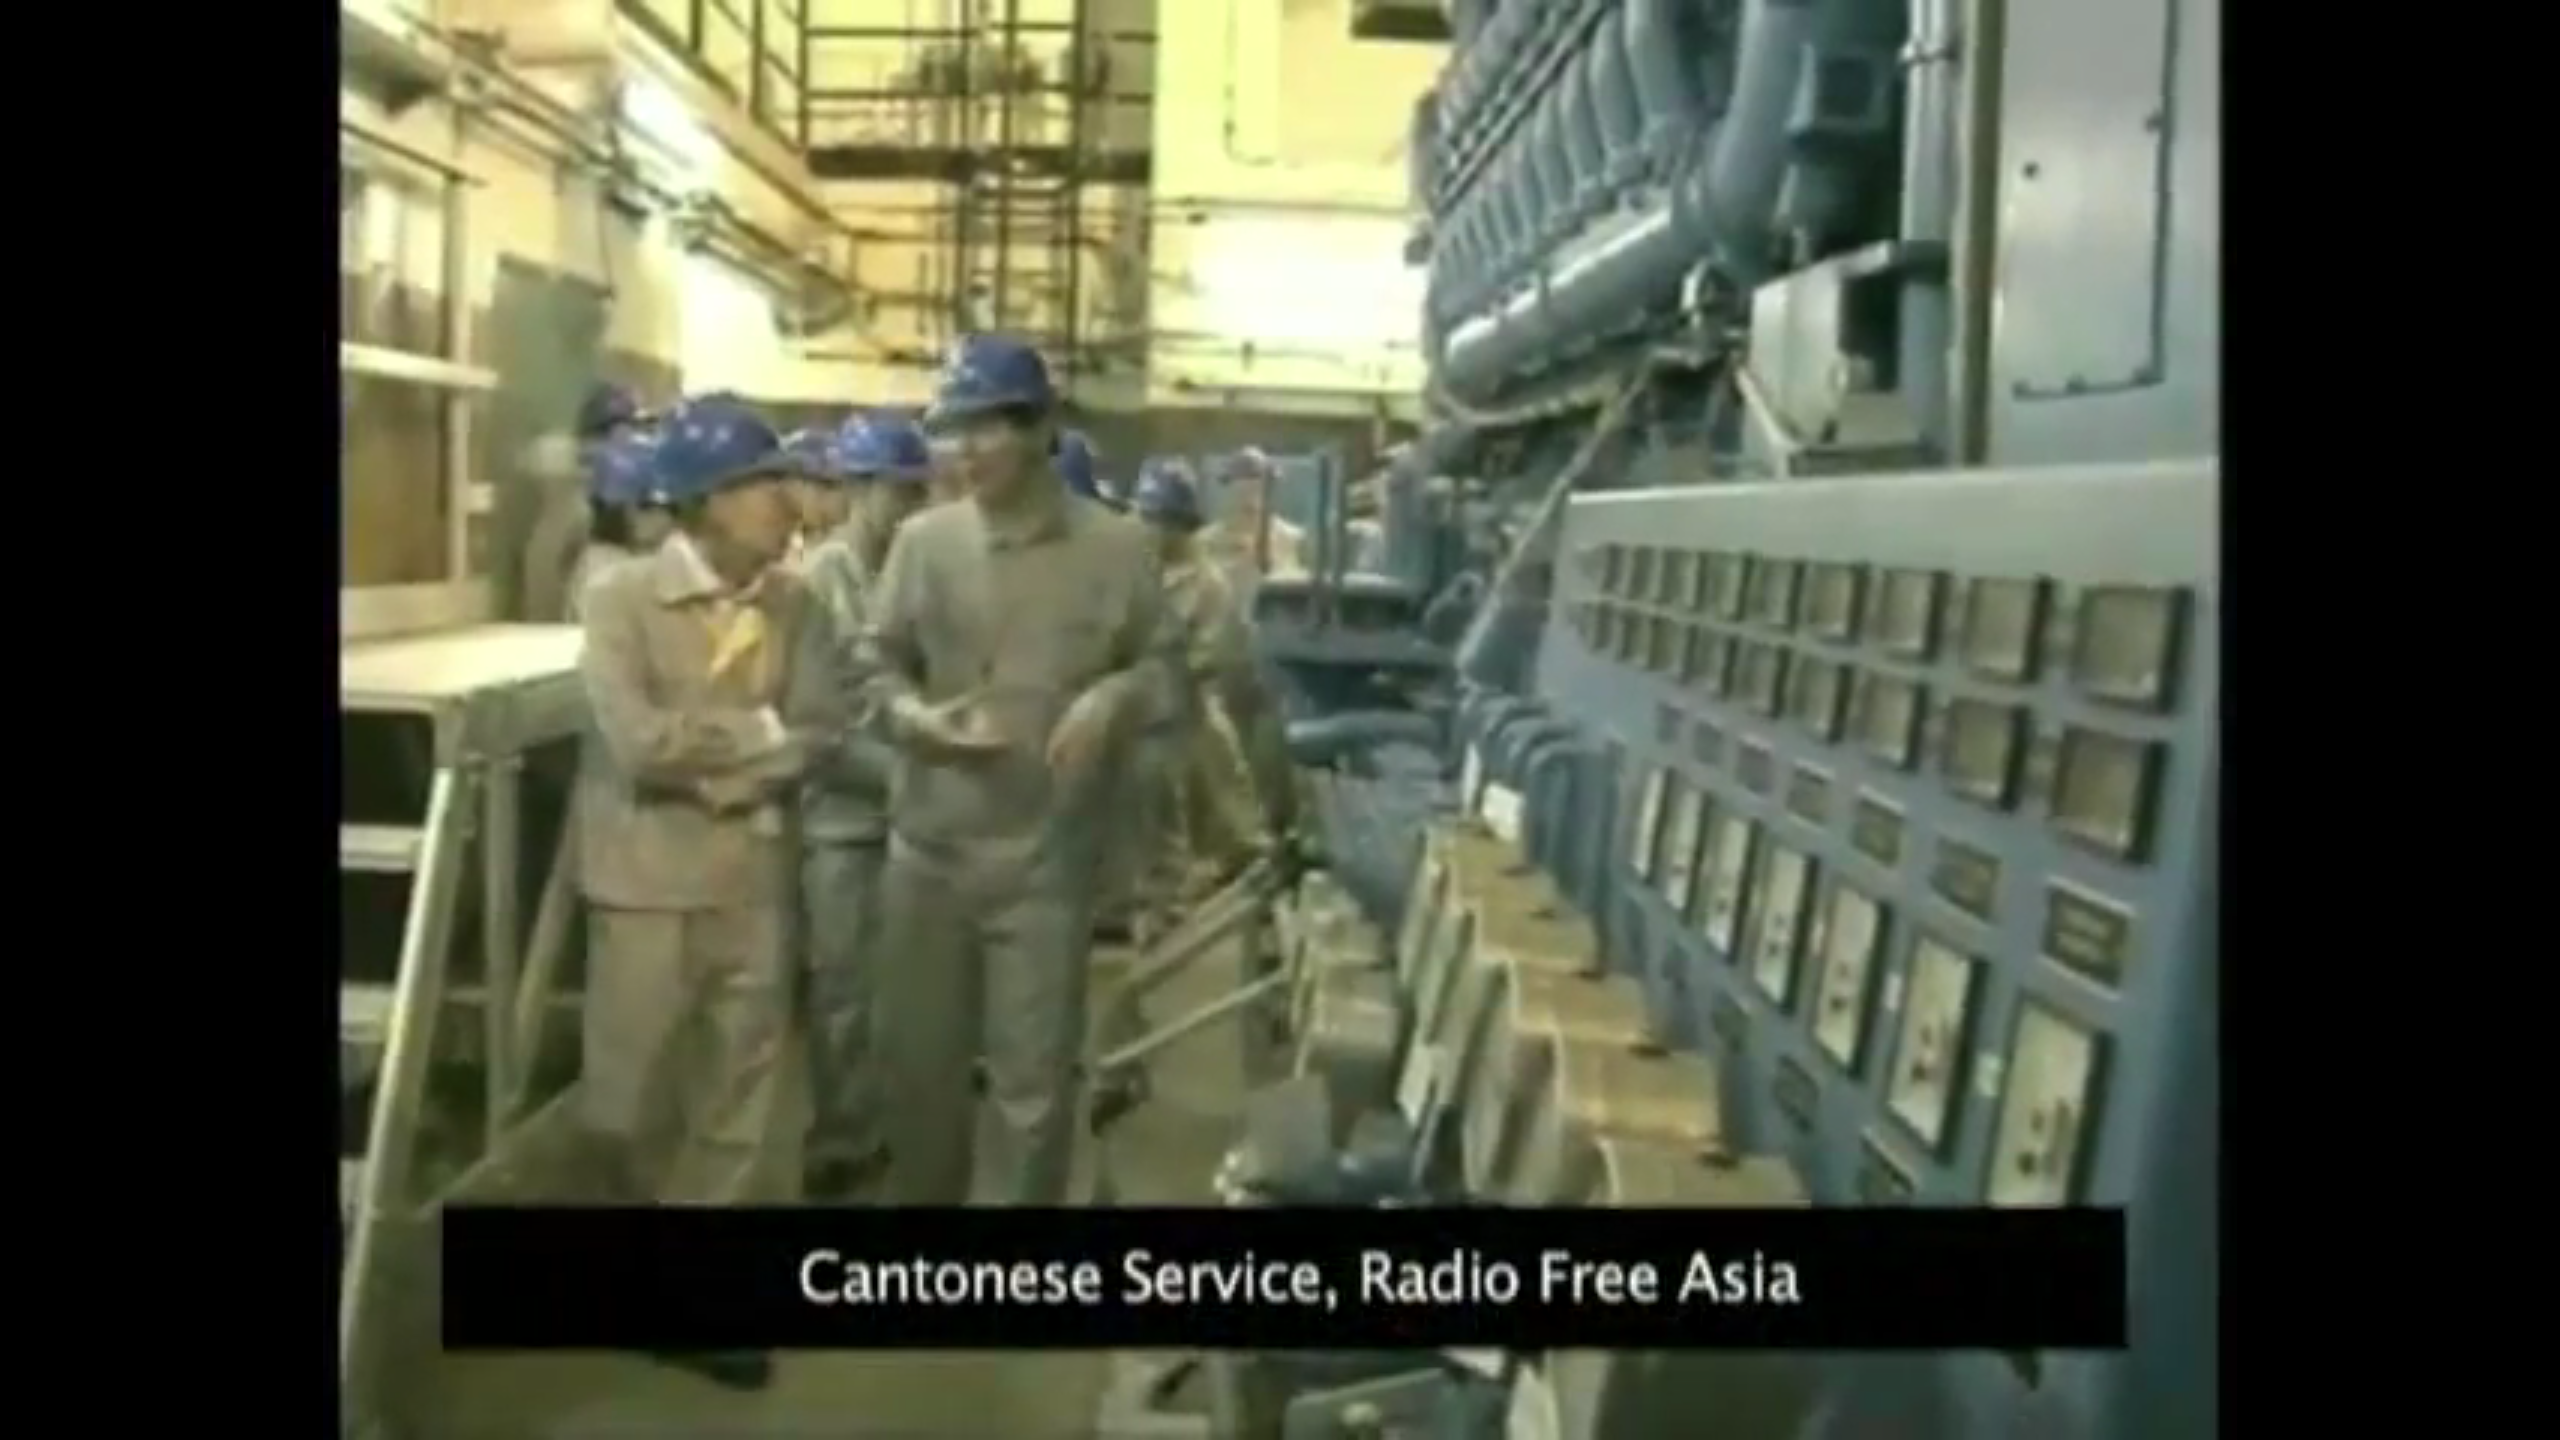 RFA's Cantonese Service